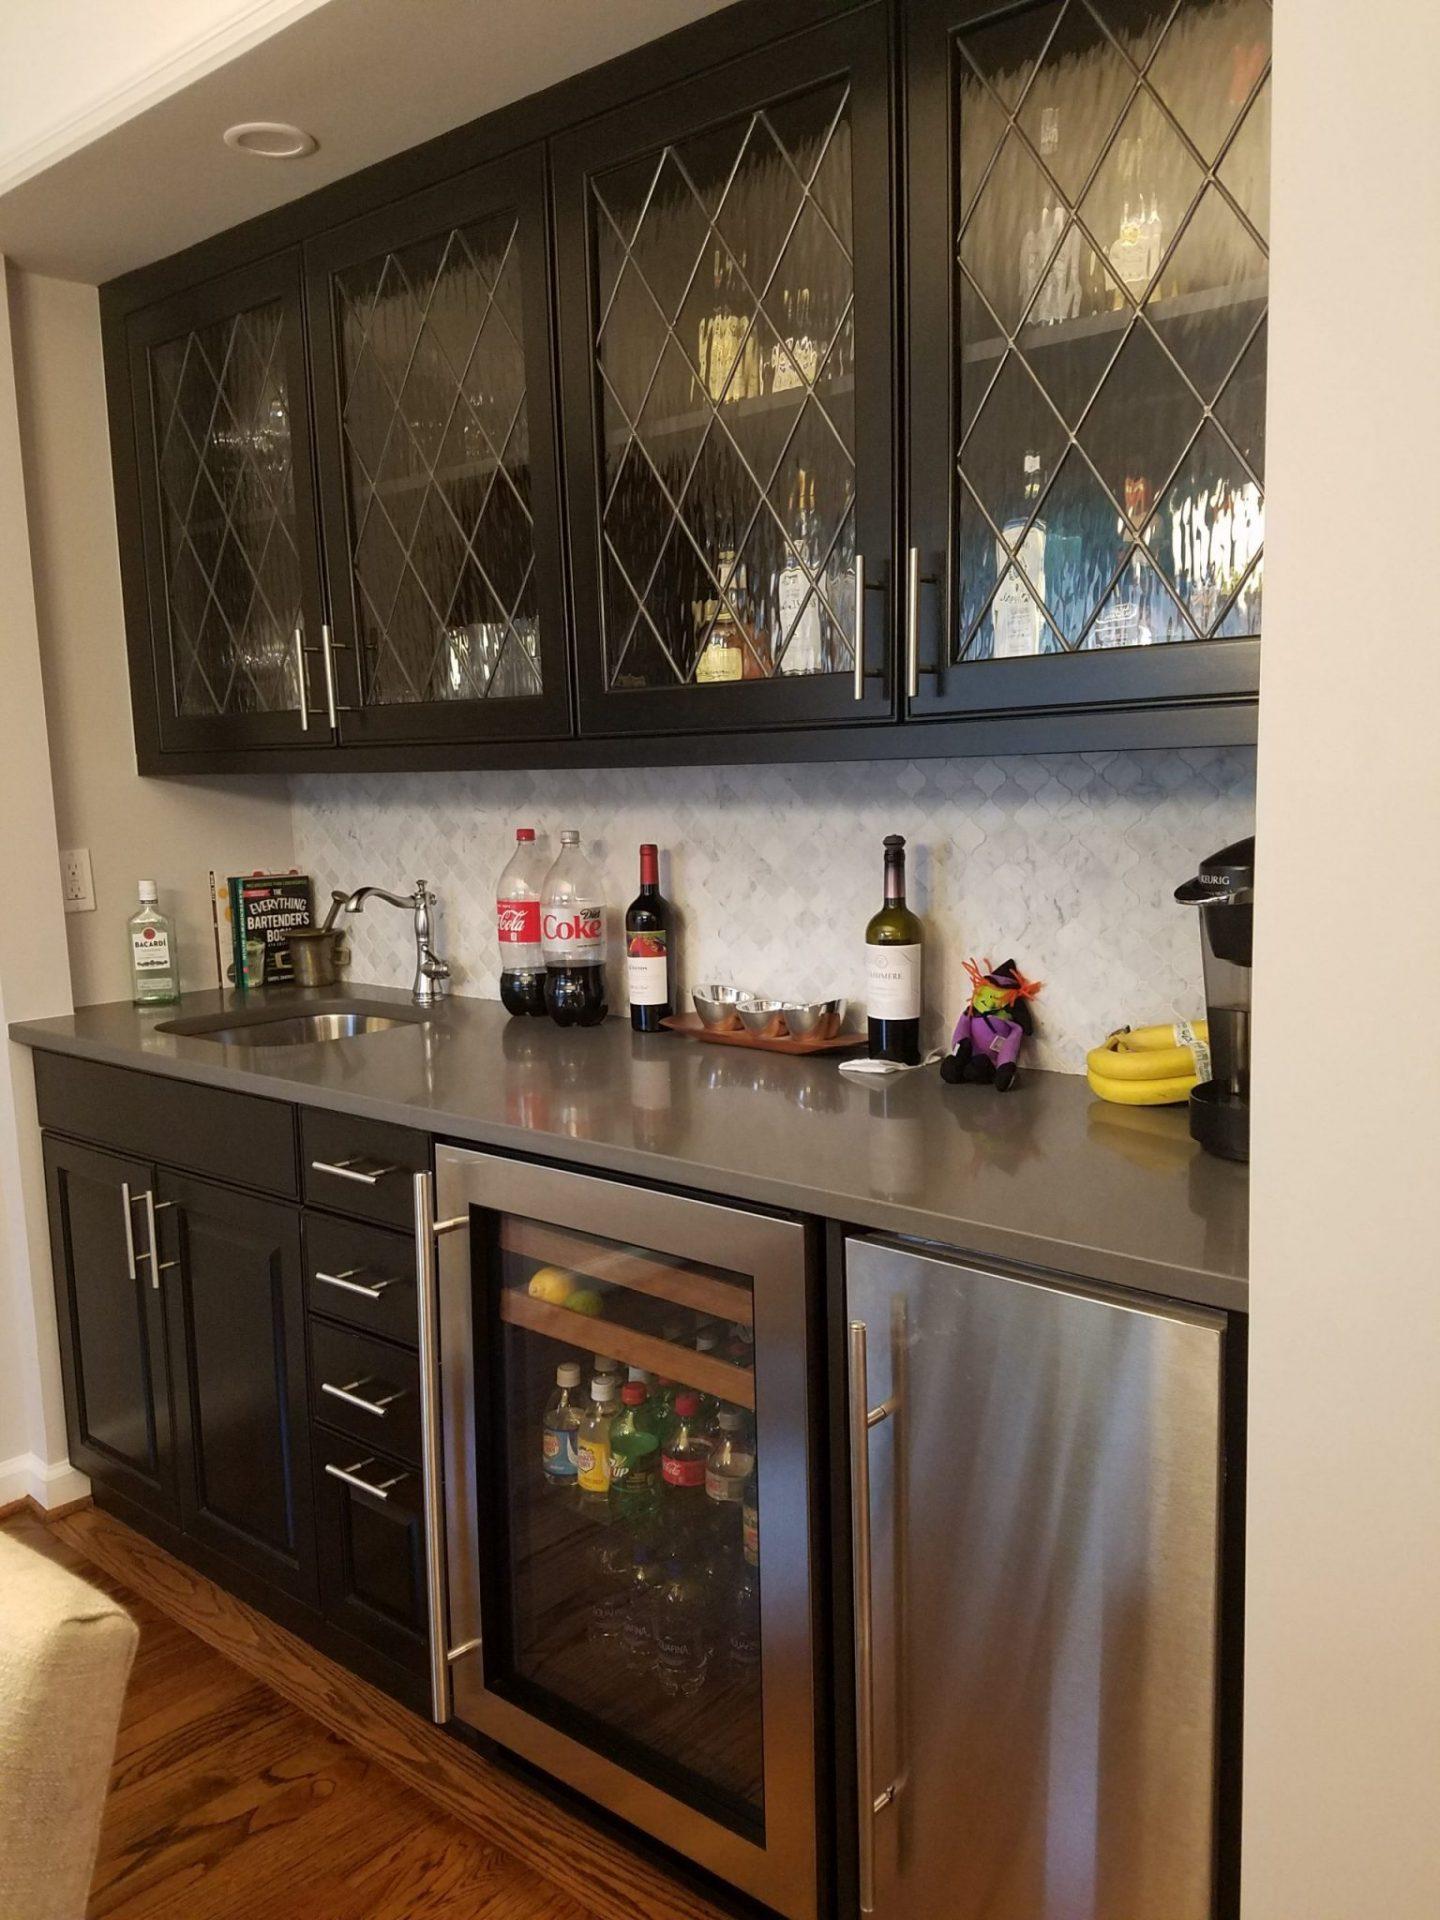 Bdg Style Idaho Project Kitchen: So Pretty! Classic Diamond Tudor Style Kitchen Cabinet Inserts